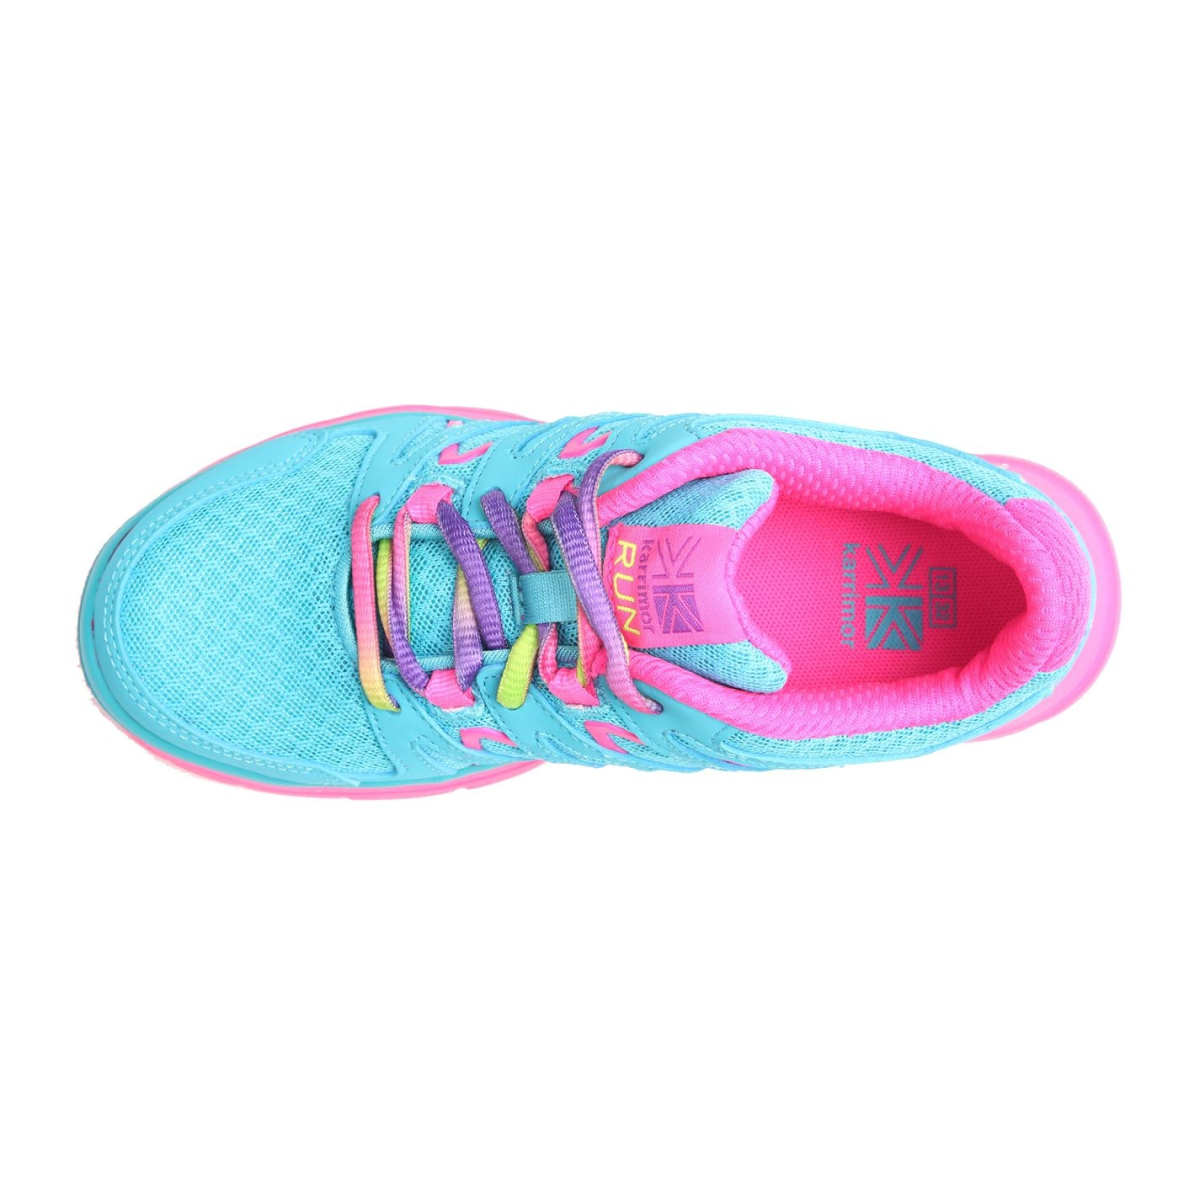 Karrimor Duma Turnschuhe Laufschuhe Mädchen Kinder Sneaker Sportschuhe 7015